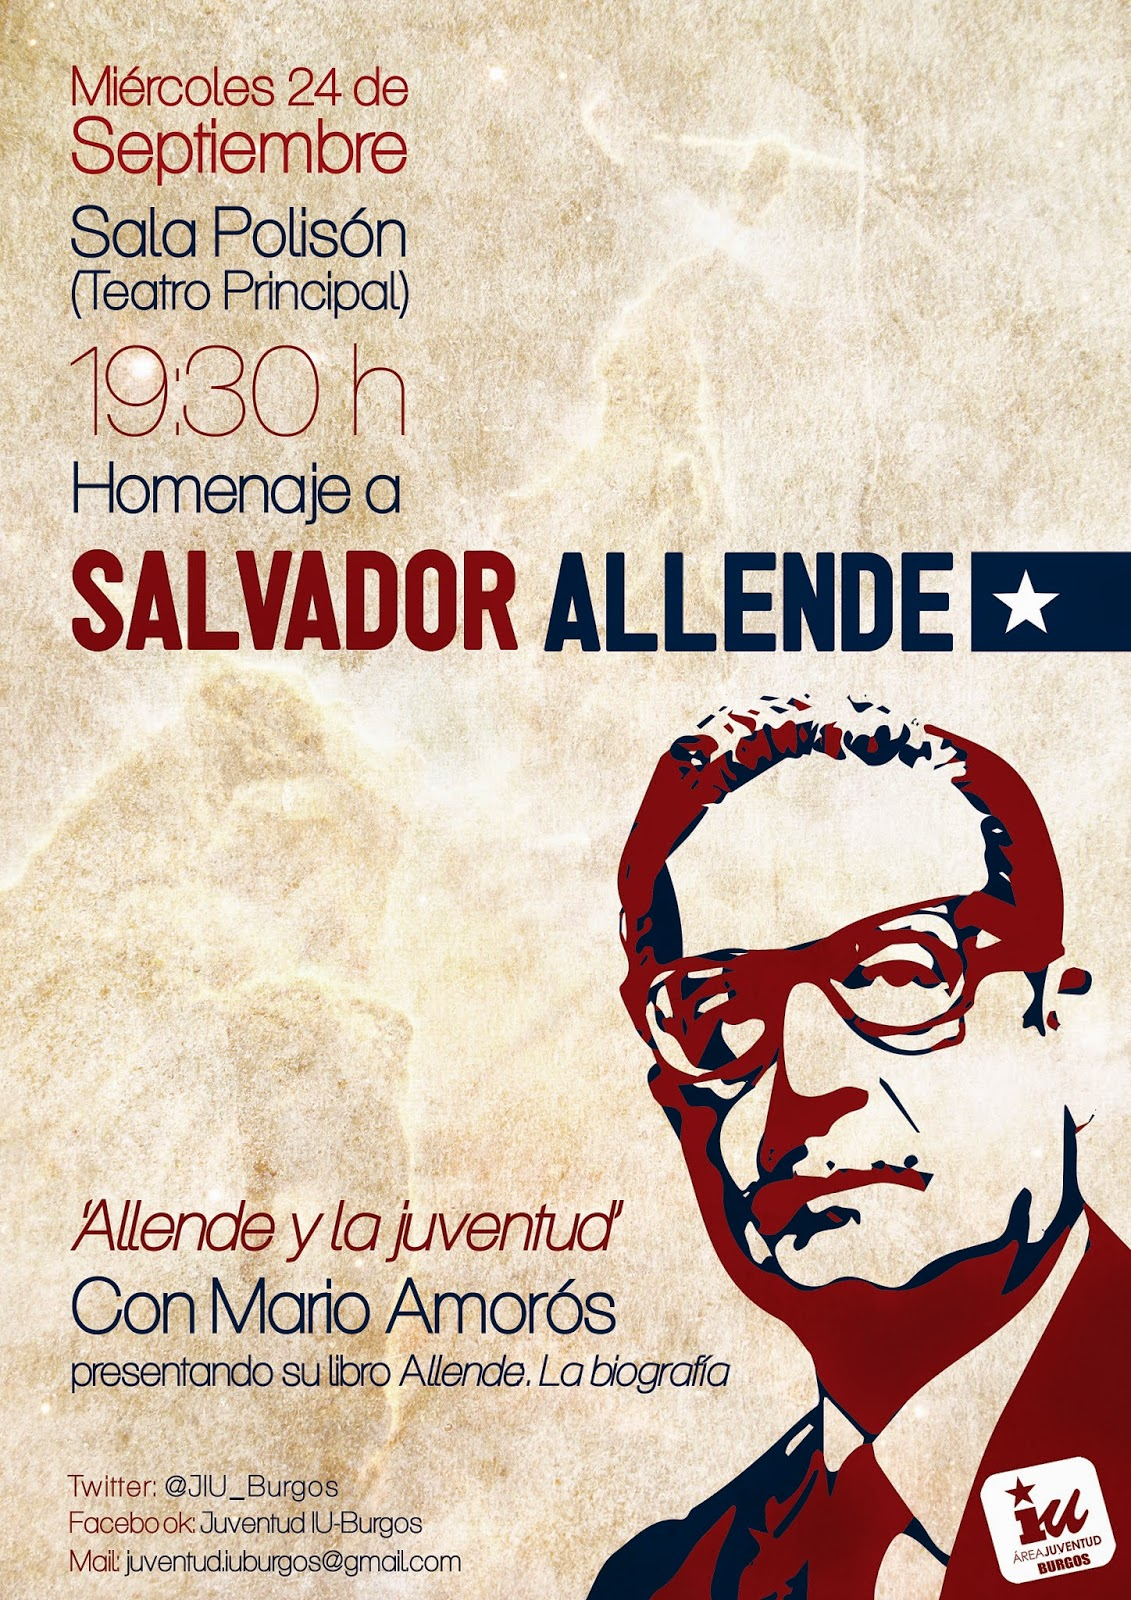 Cartel+Allende+contactos+juve